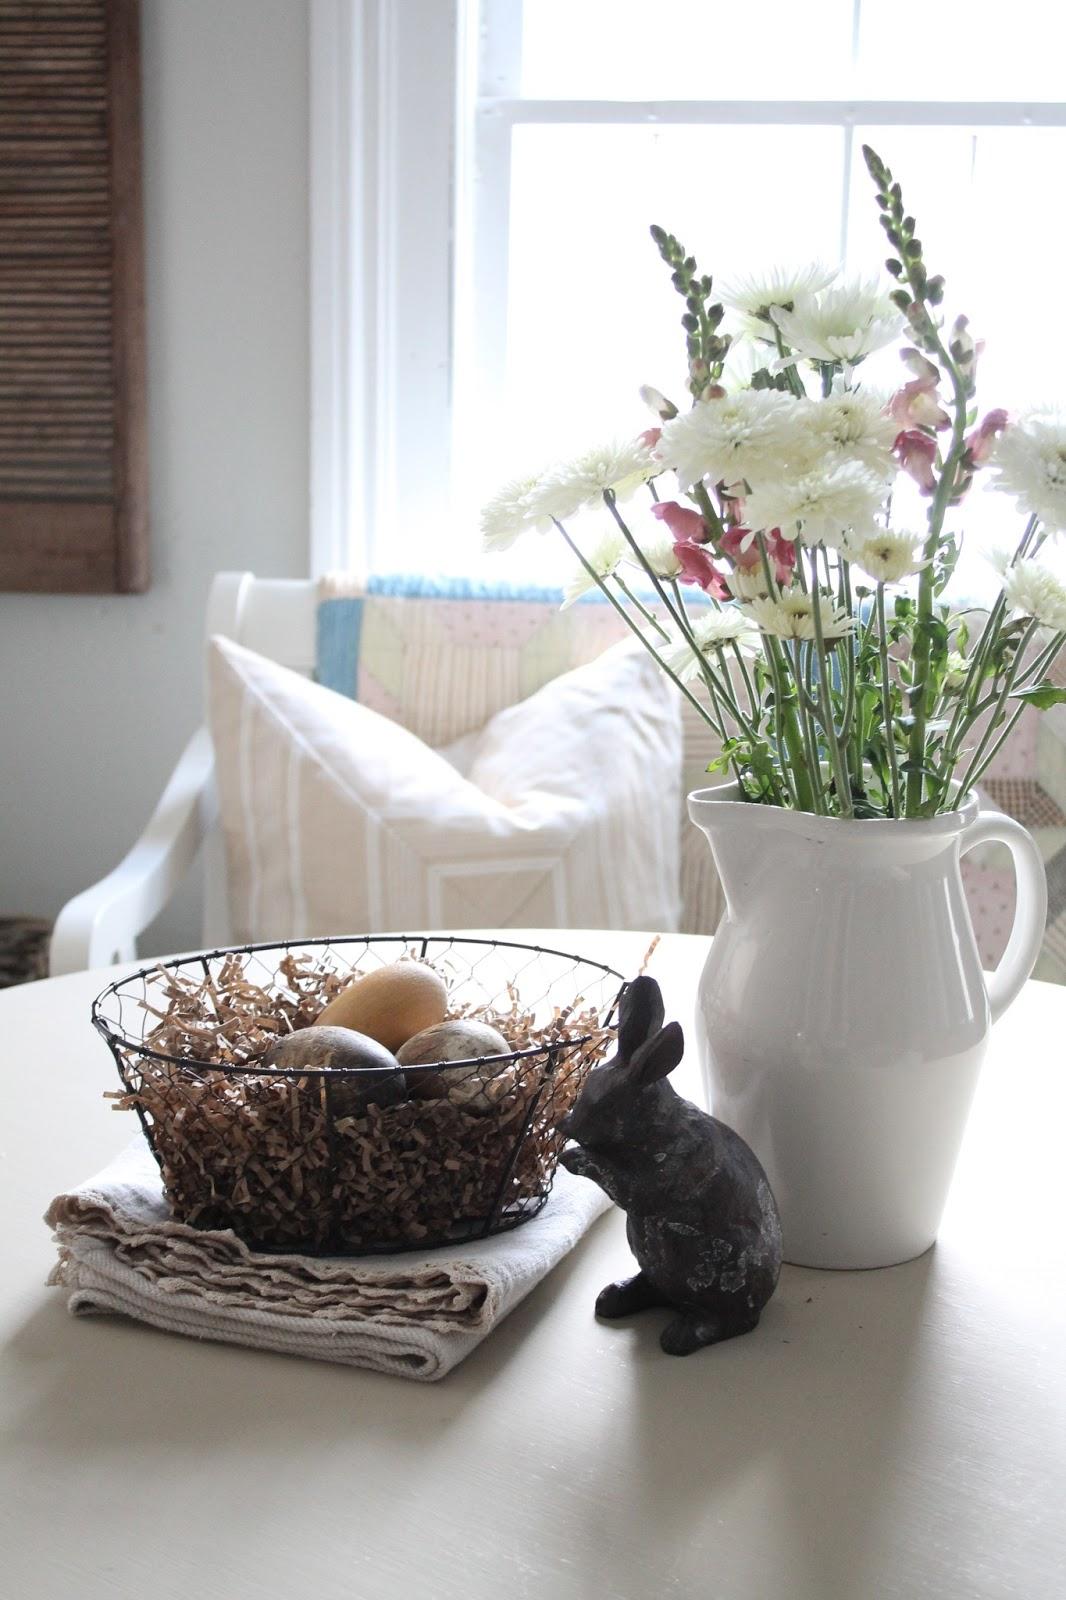 FARMHOUSE 5540 Spring Decorating